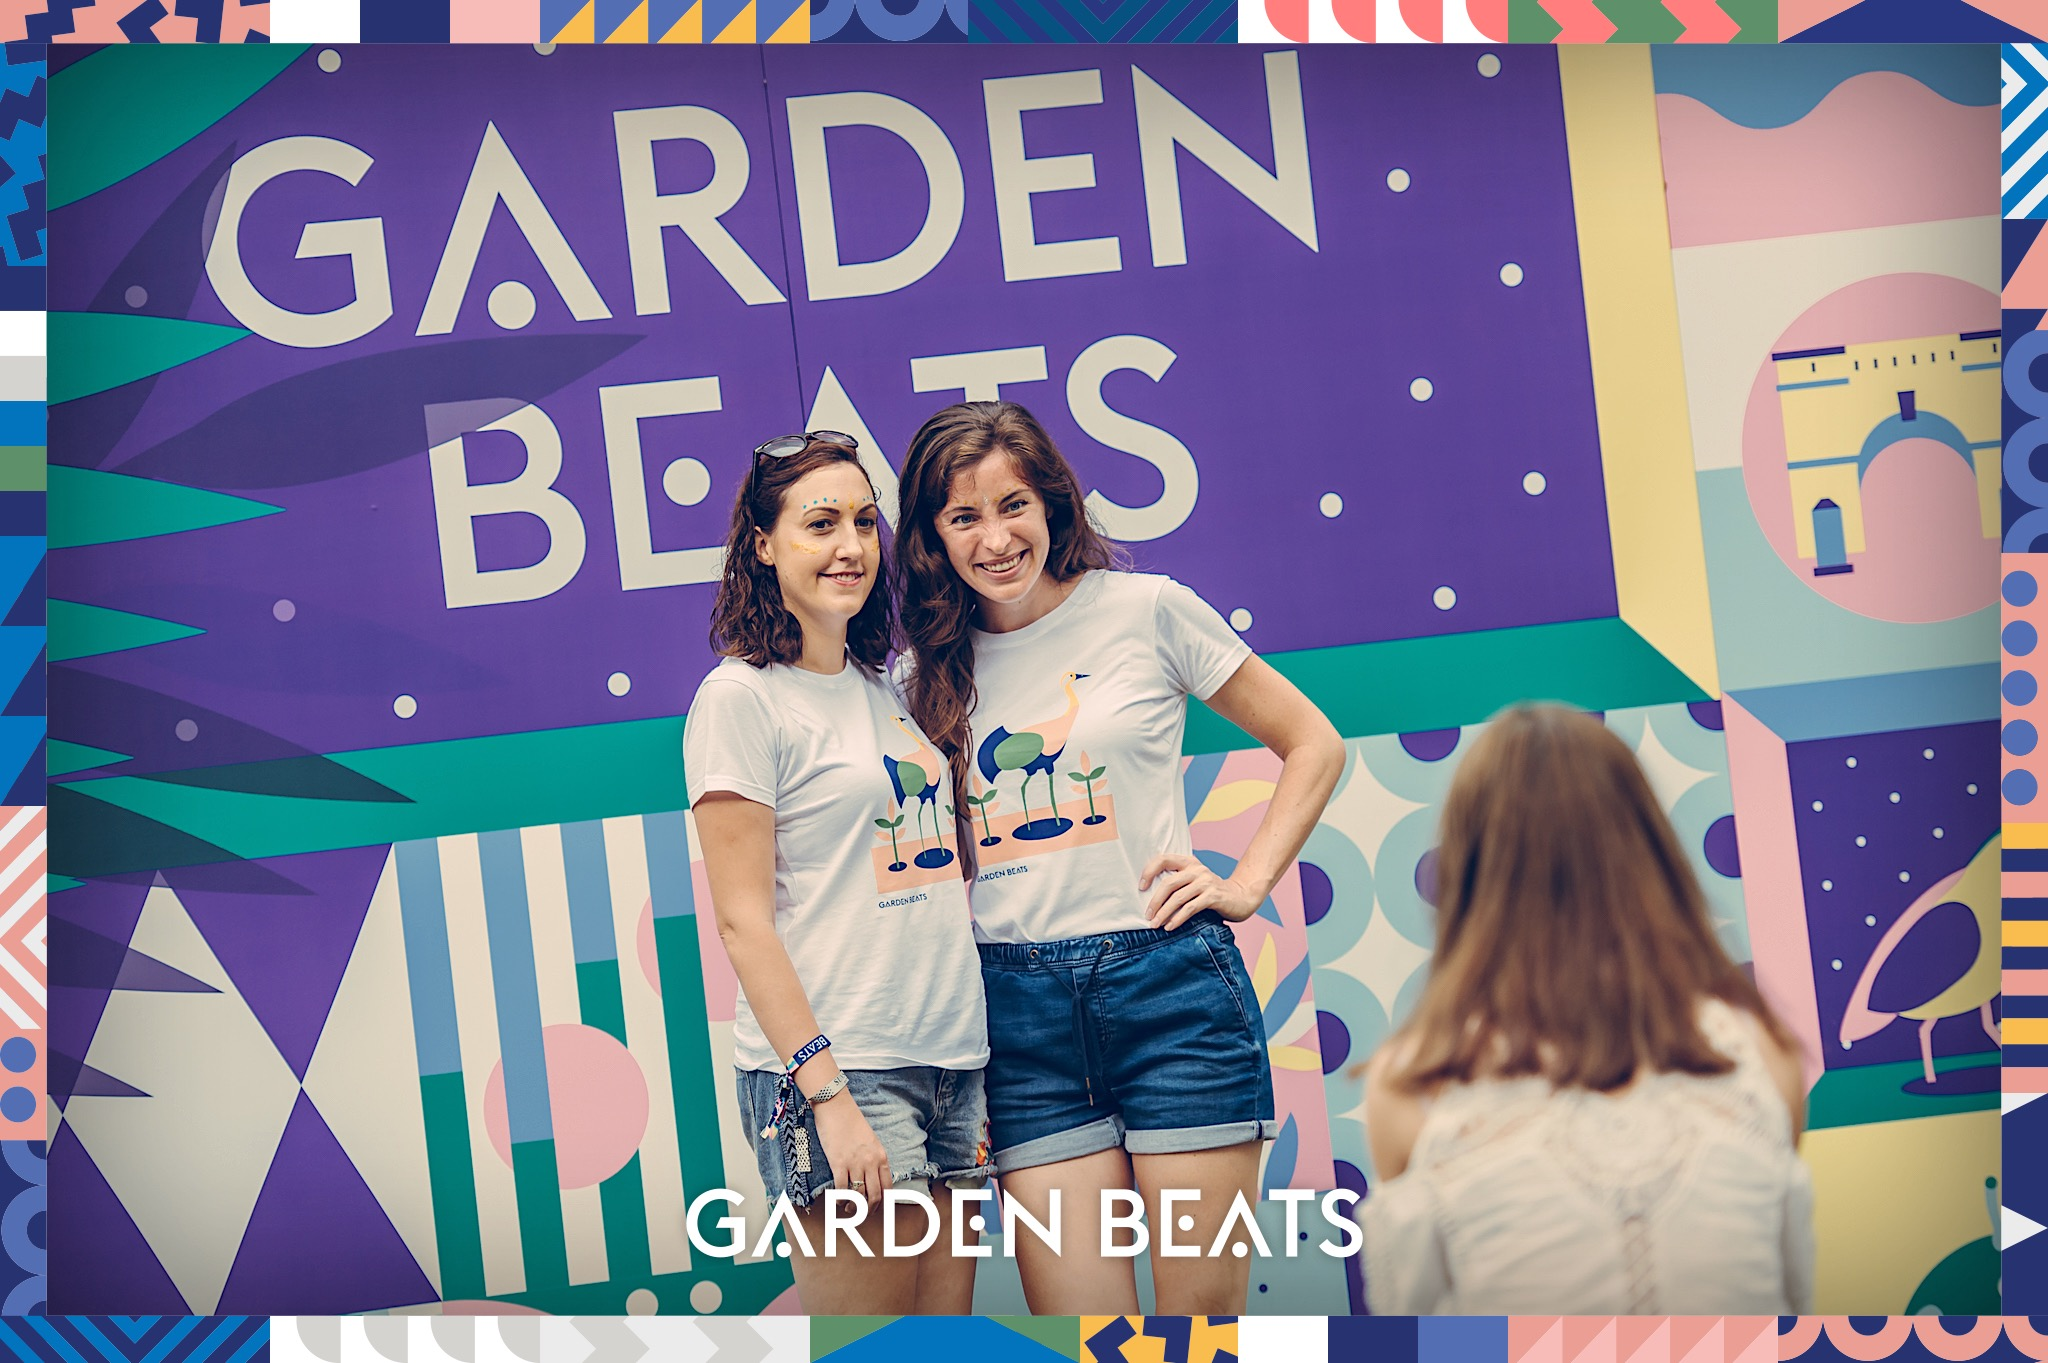 03032018_GardenBeats_Colossal432_Watermarked.jpg